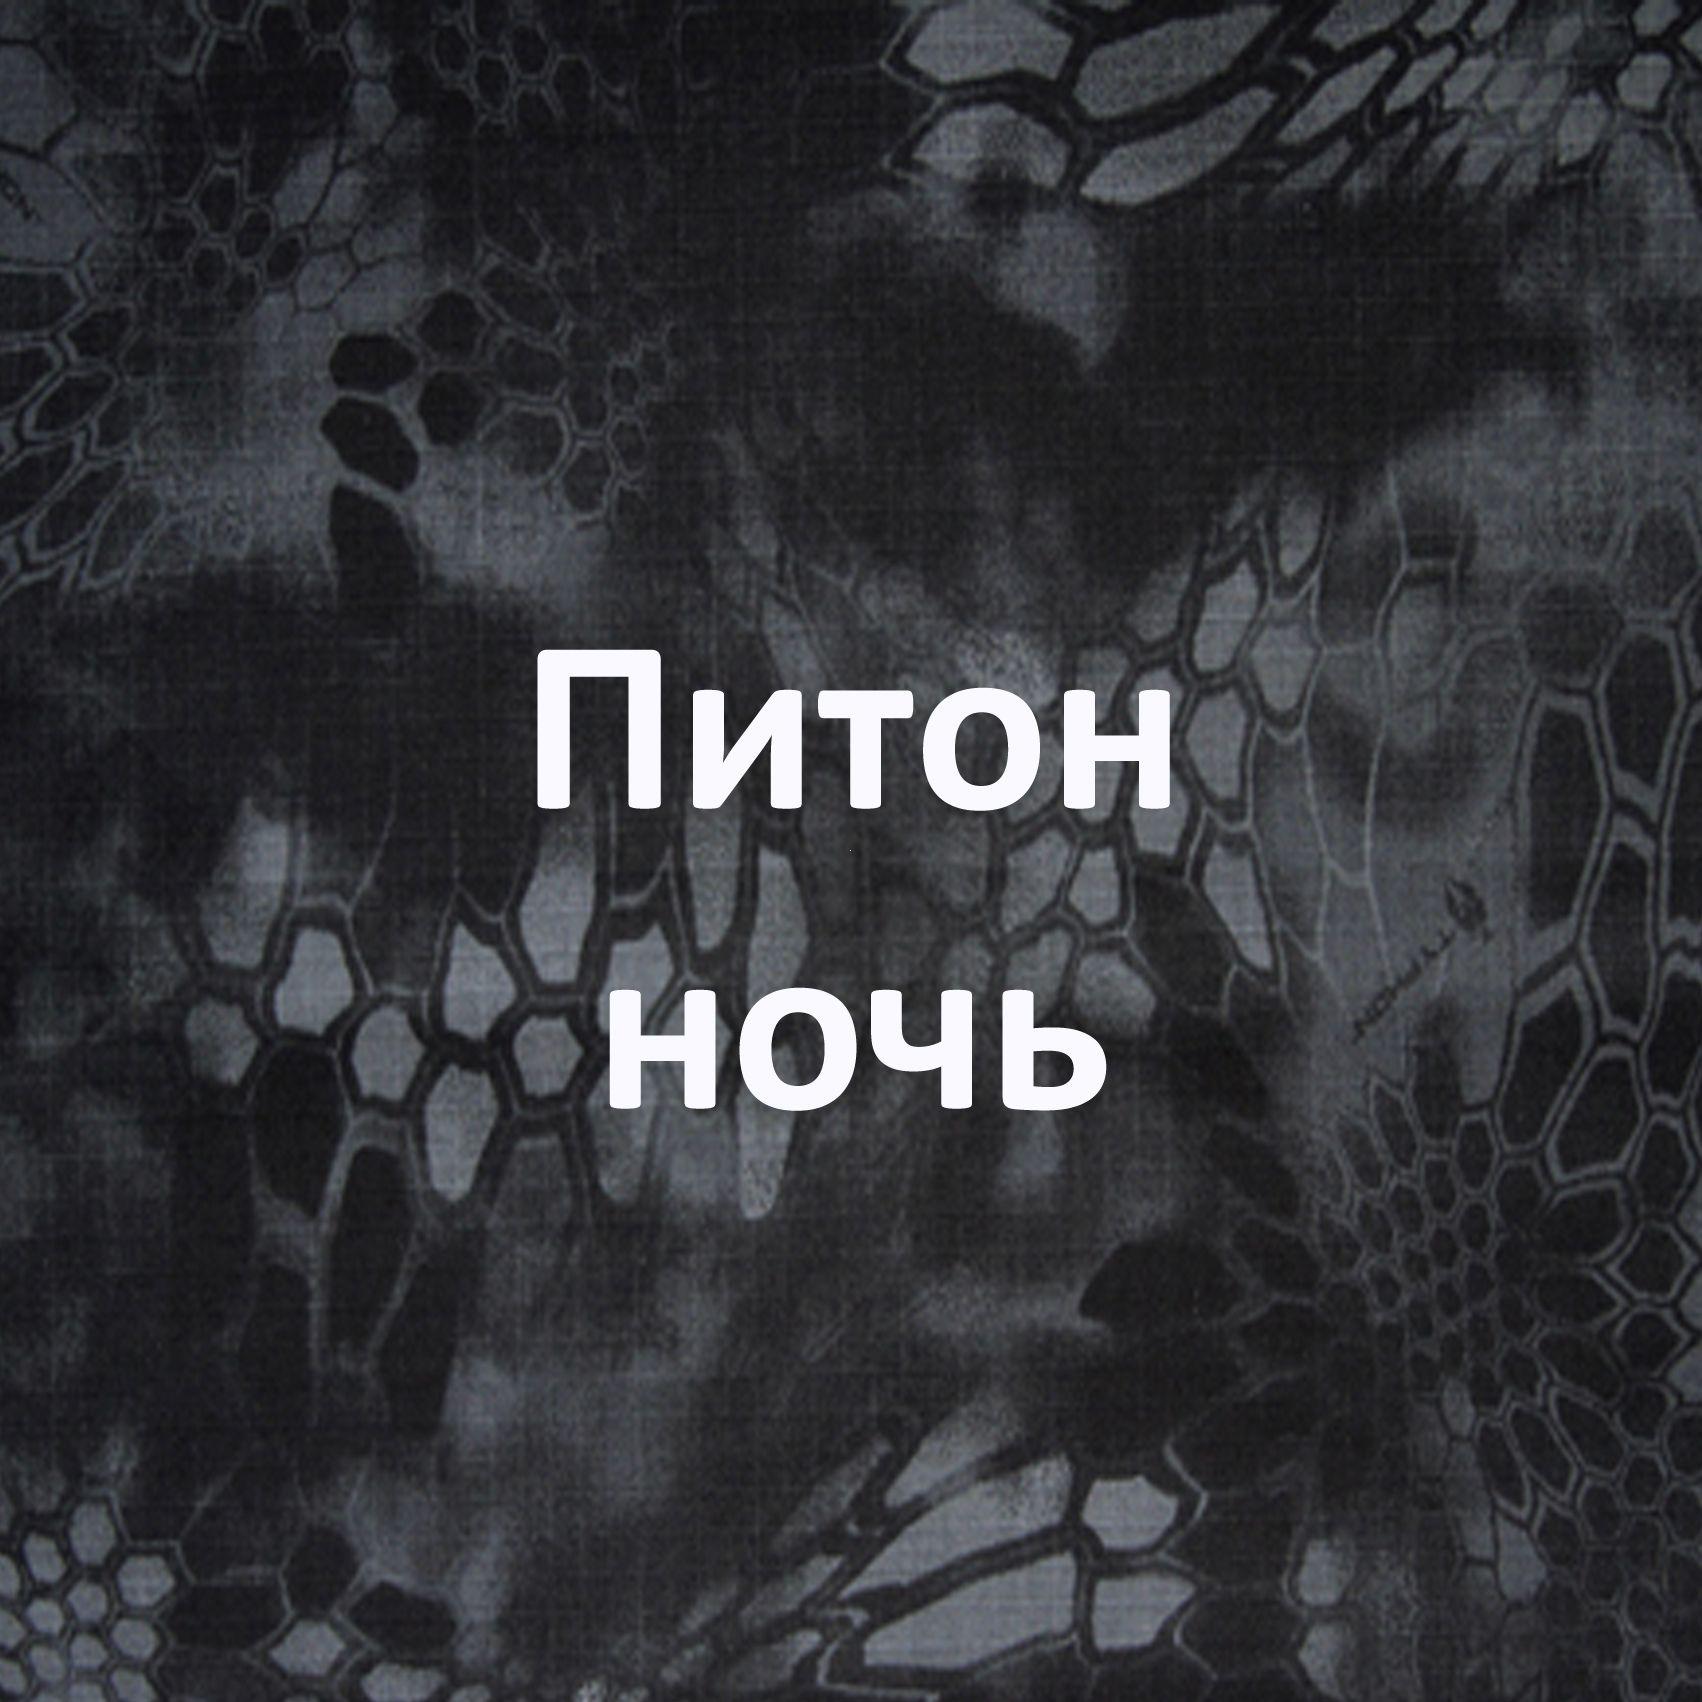 https://forma-odezhda.ru/image/data/05/piton_noch.jpg